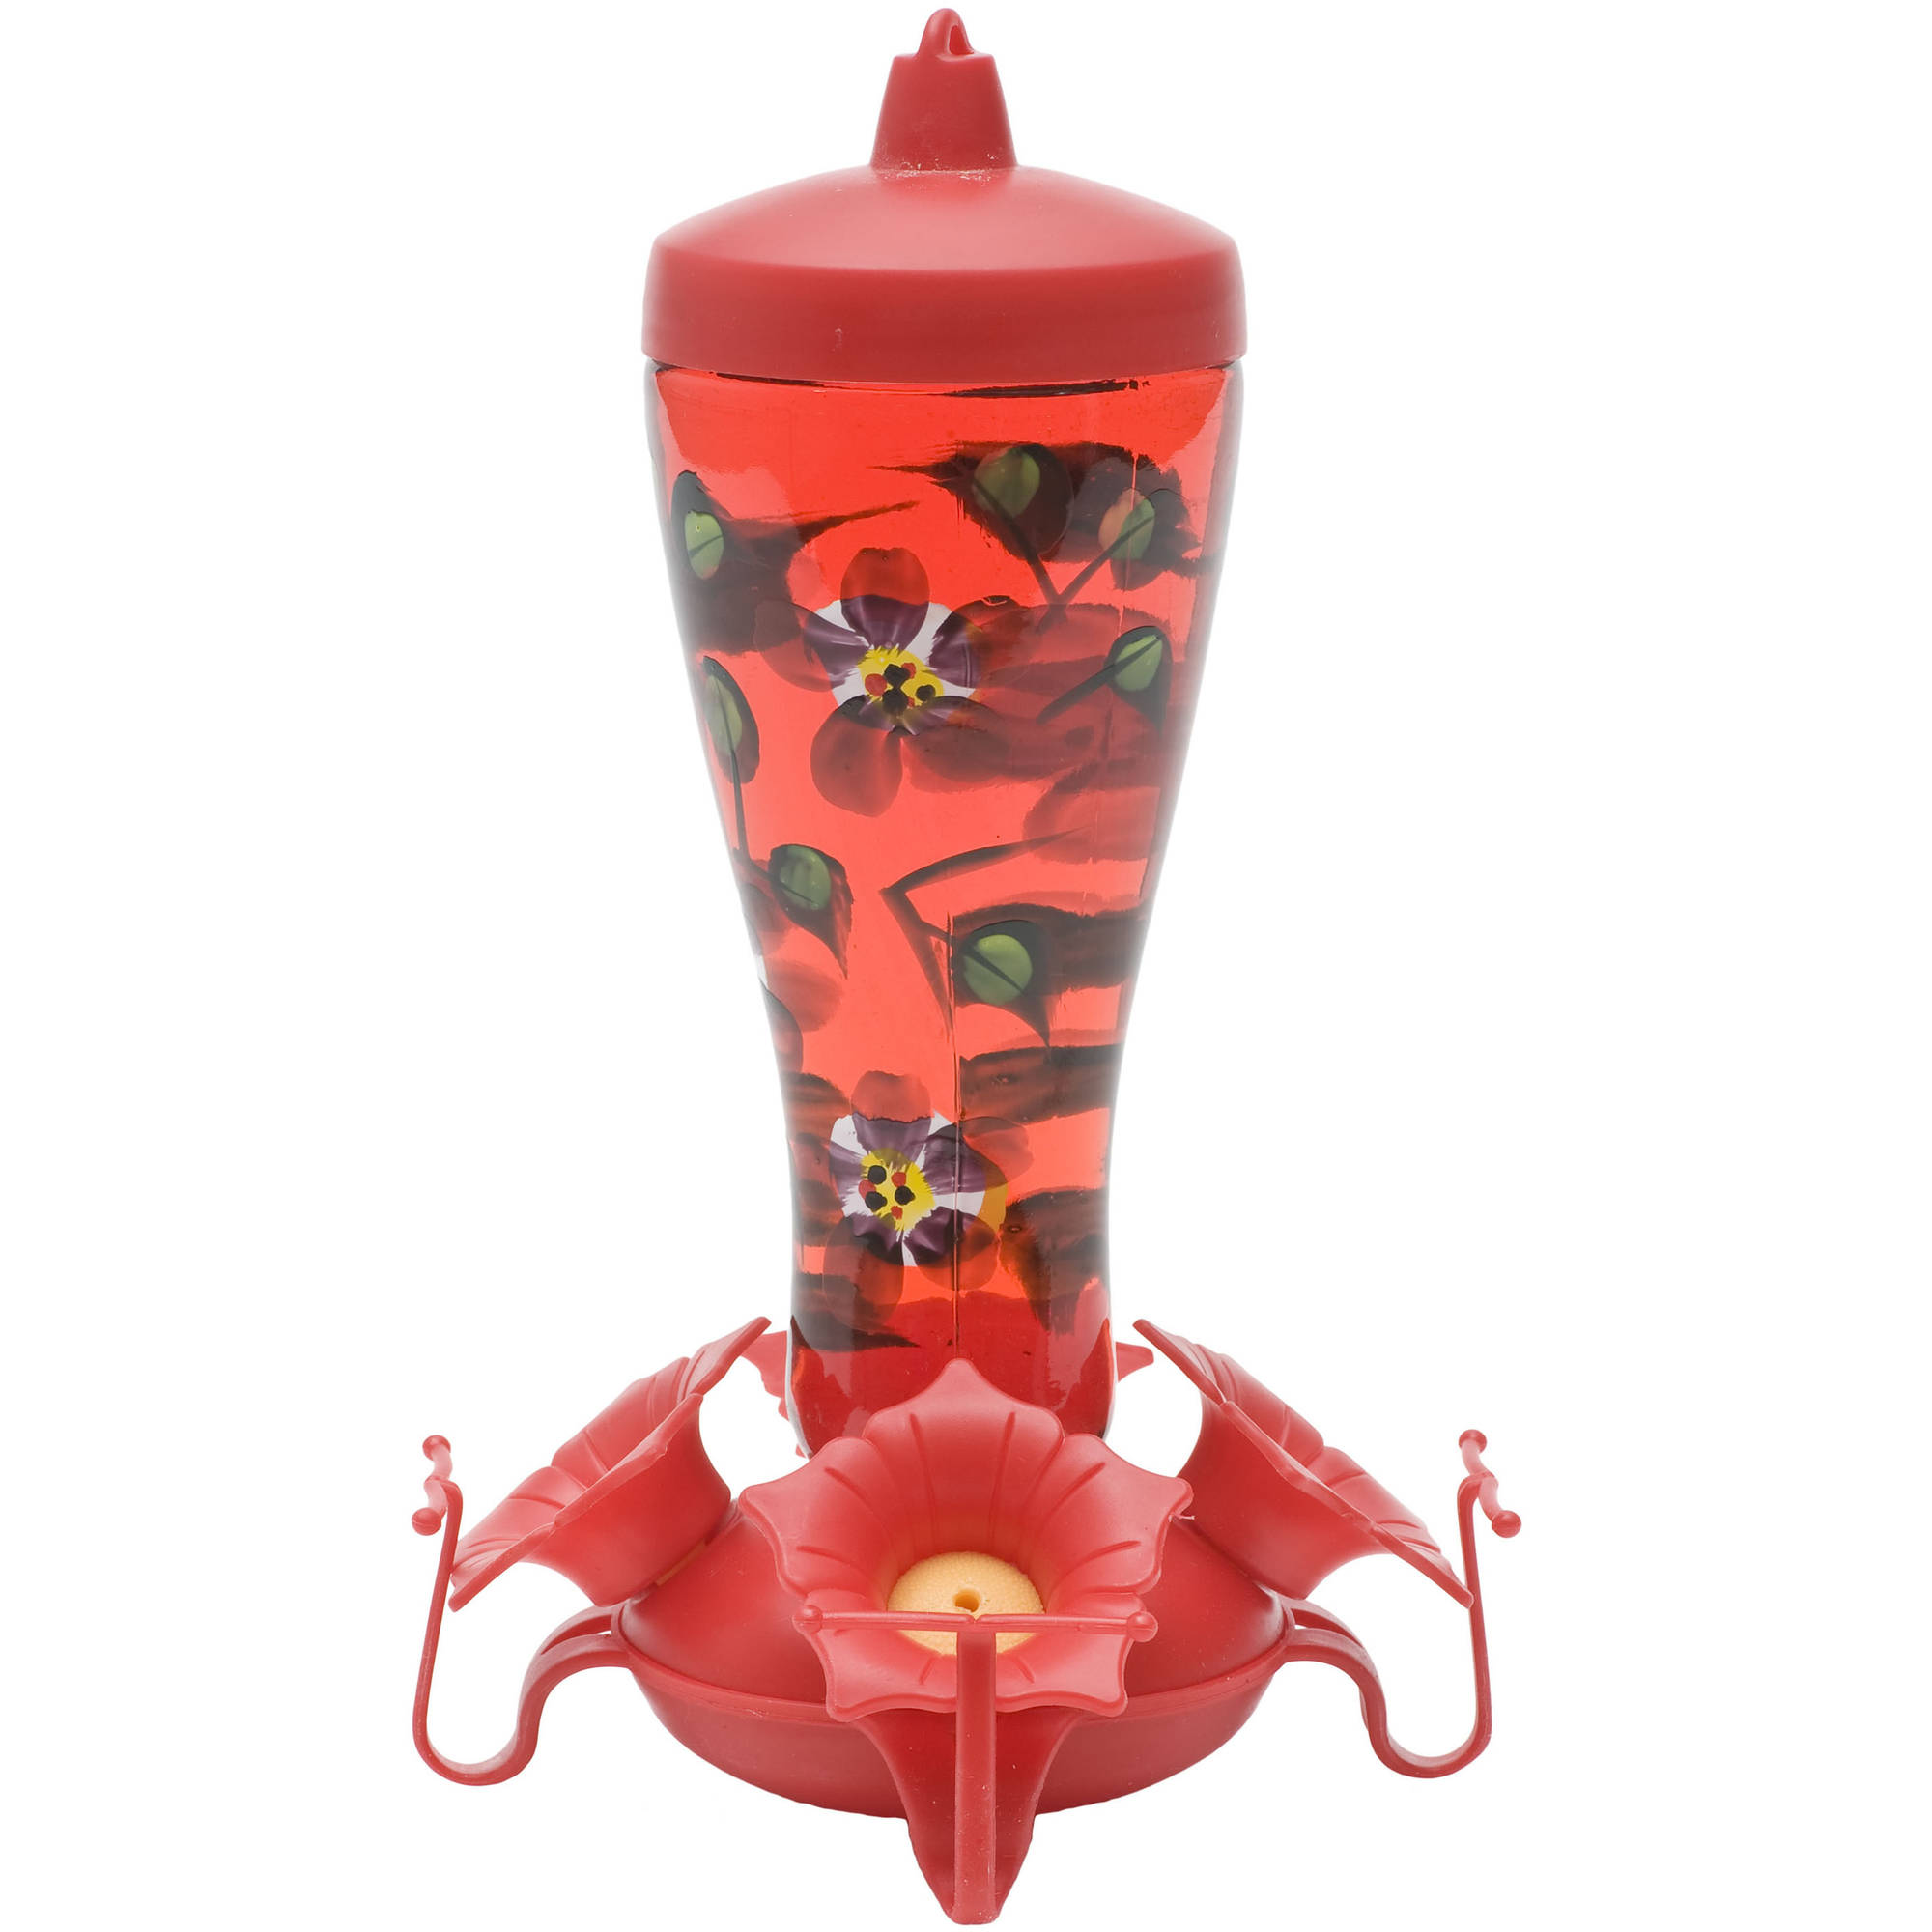 Perky-Pet 10 oz Hand Painted Glass Hummingbird Feeder